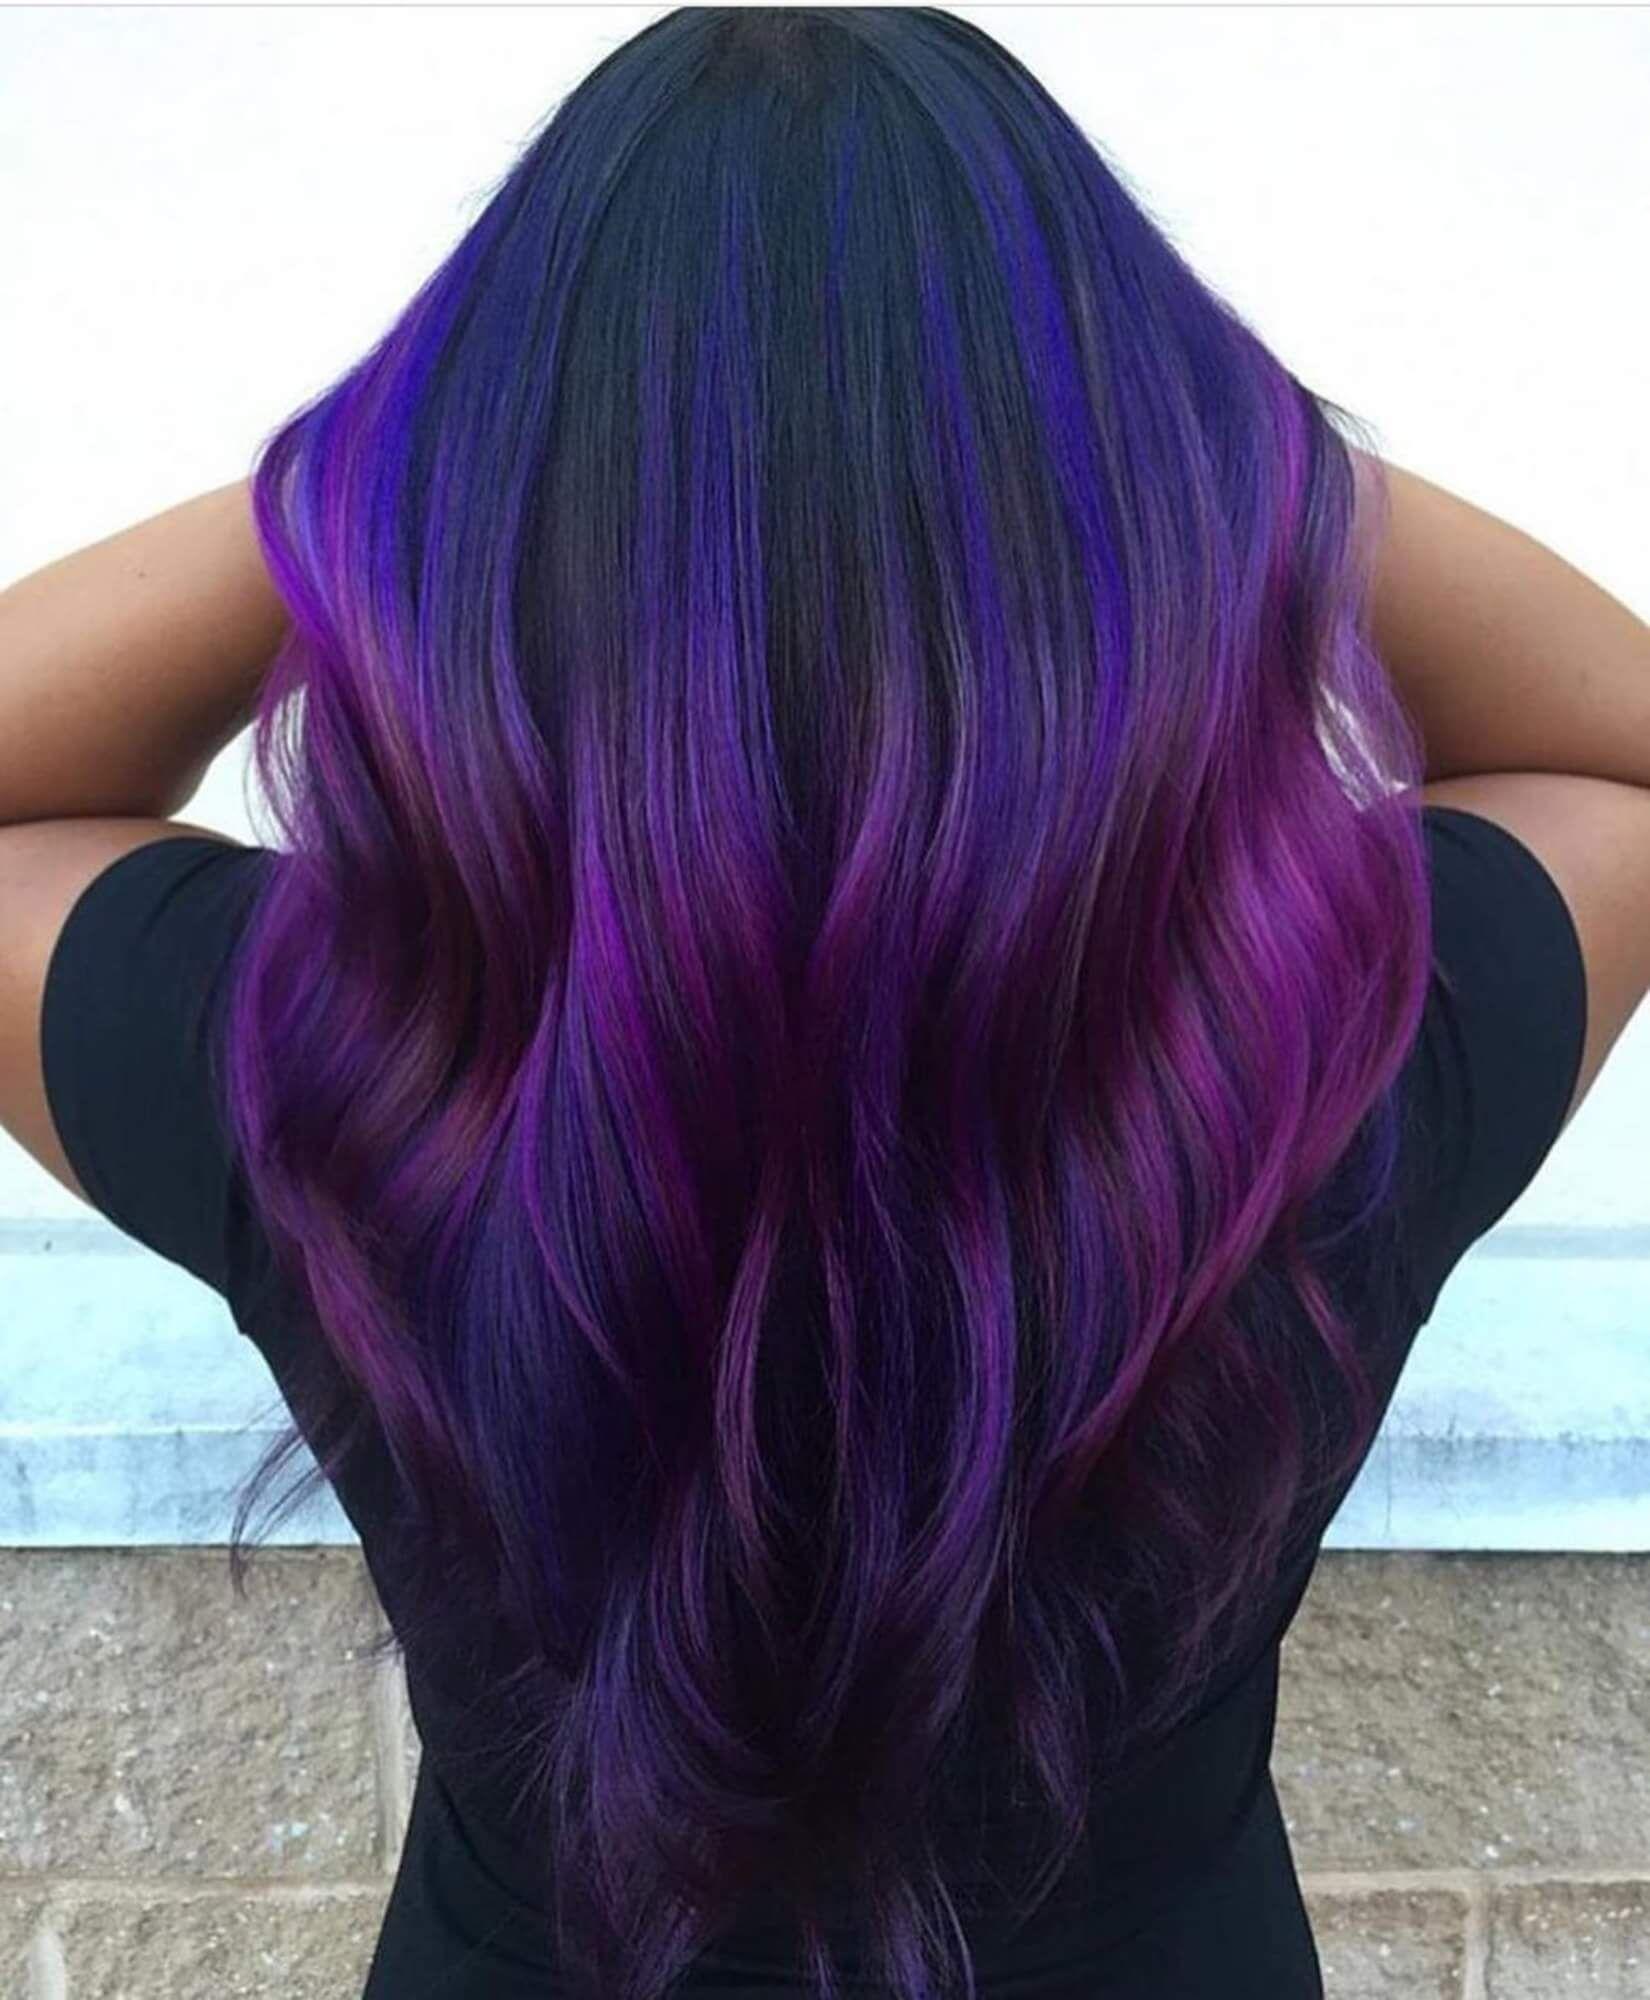 Lila Haarfarbe  Haarfarben, Lila haarfarbe, Lila haare